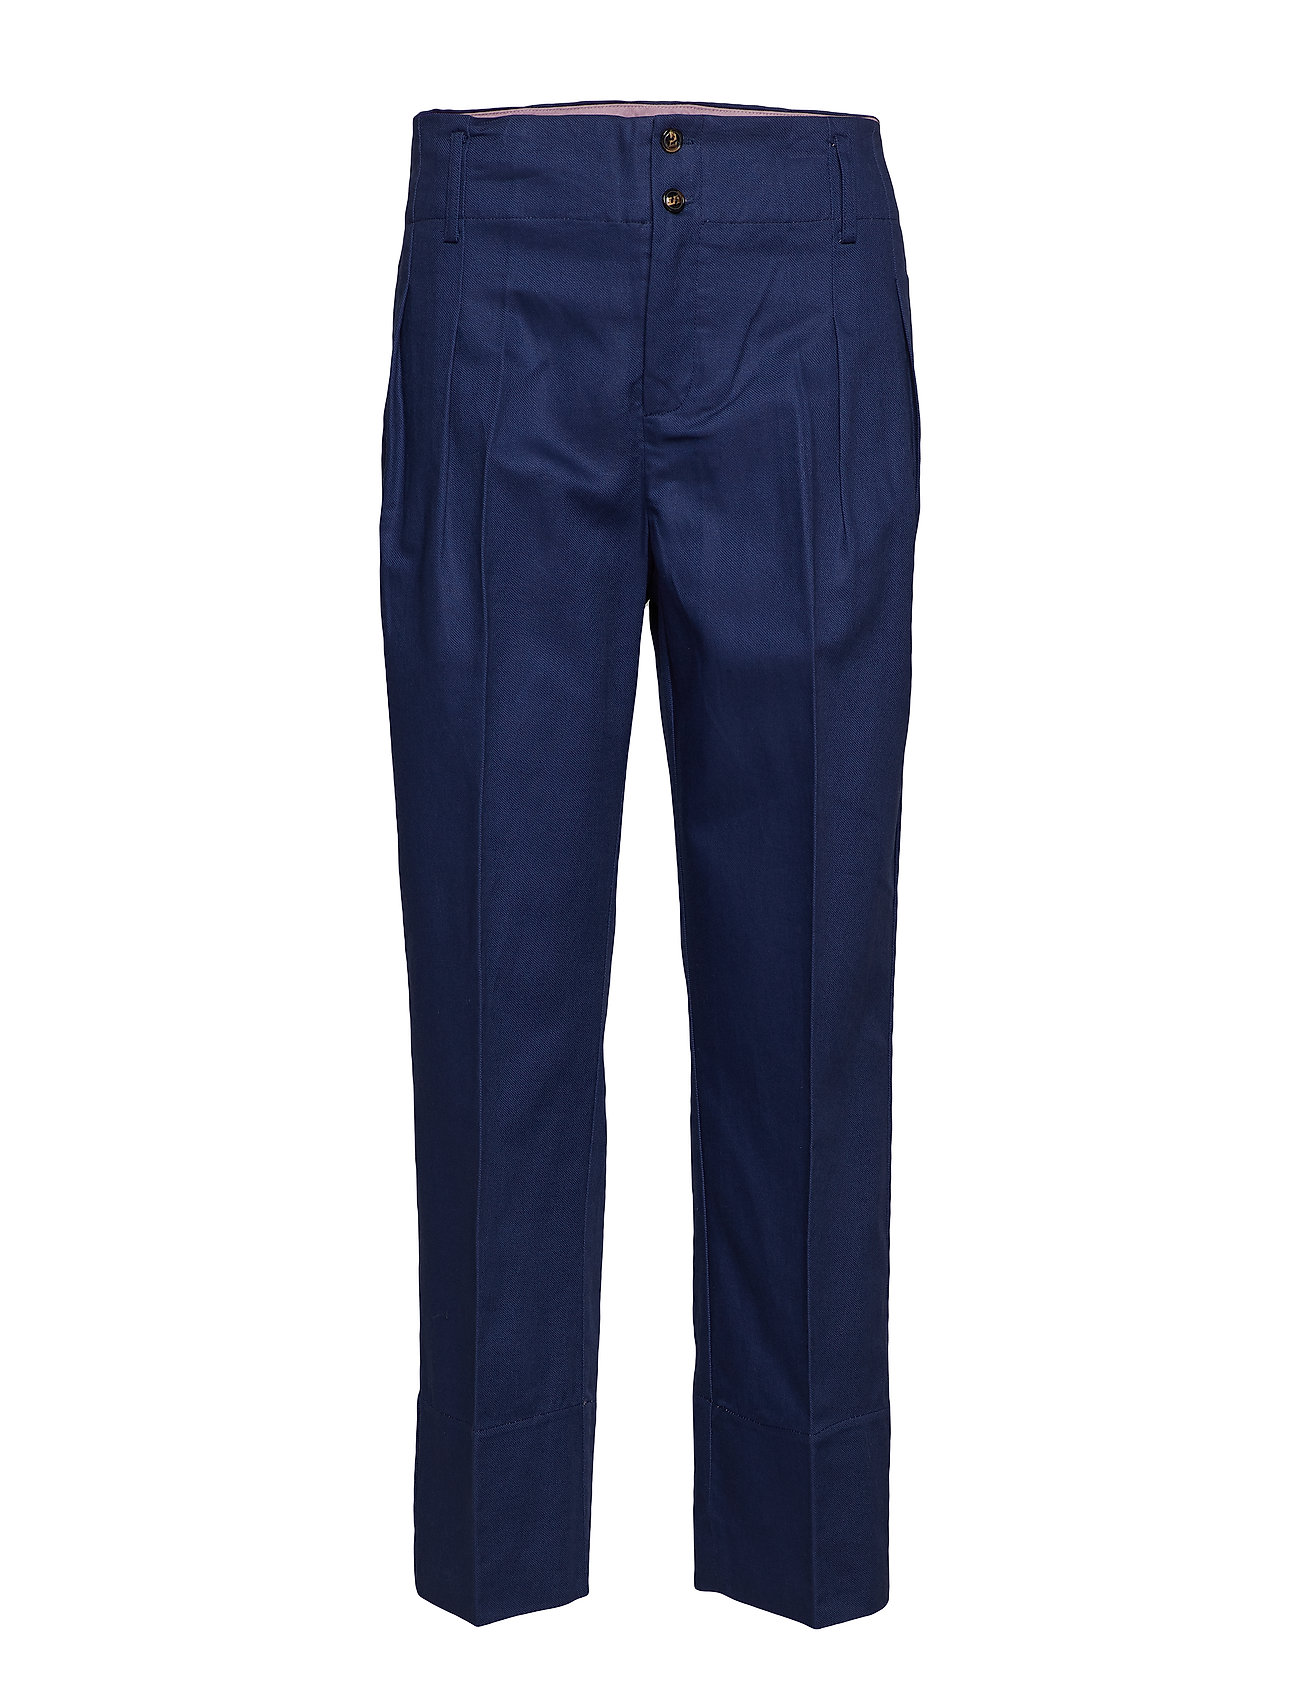 BlueNoa Trouserspatriot BlueNoa Trouserspatriot Trouserspatriot BlueNoa BlueNoa Trouserspatriot Trouserspatriot WI2E9DH